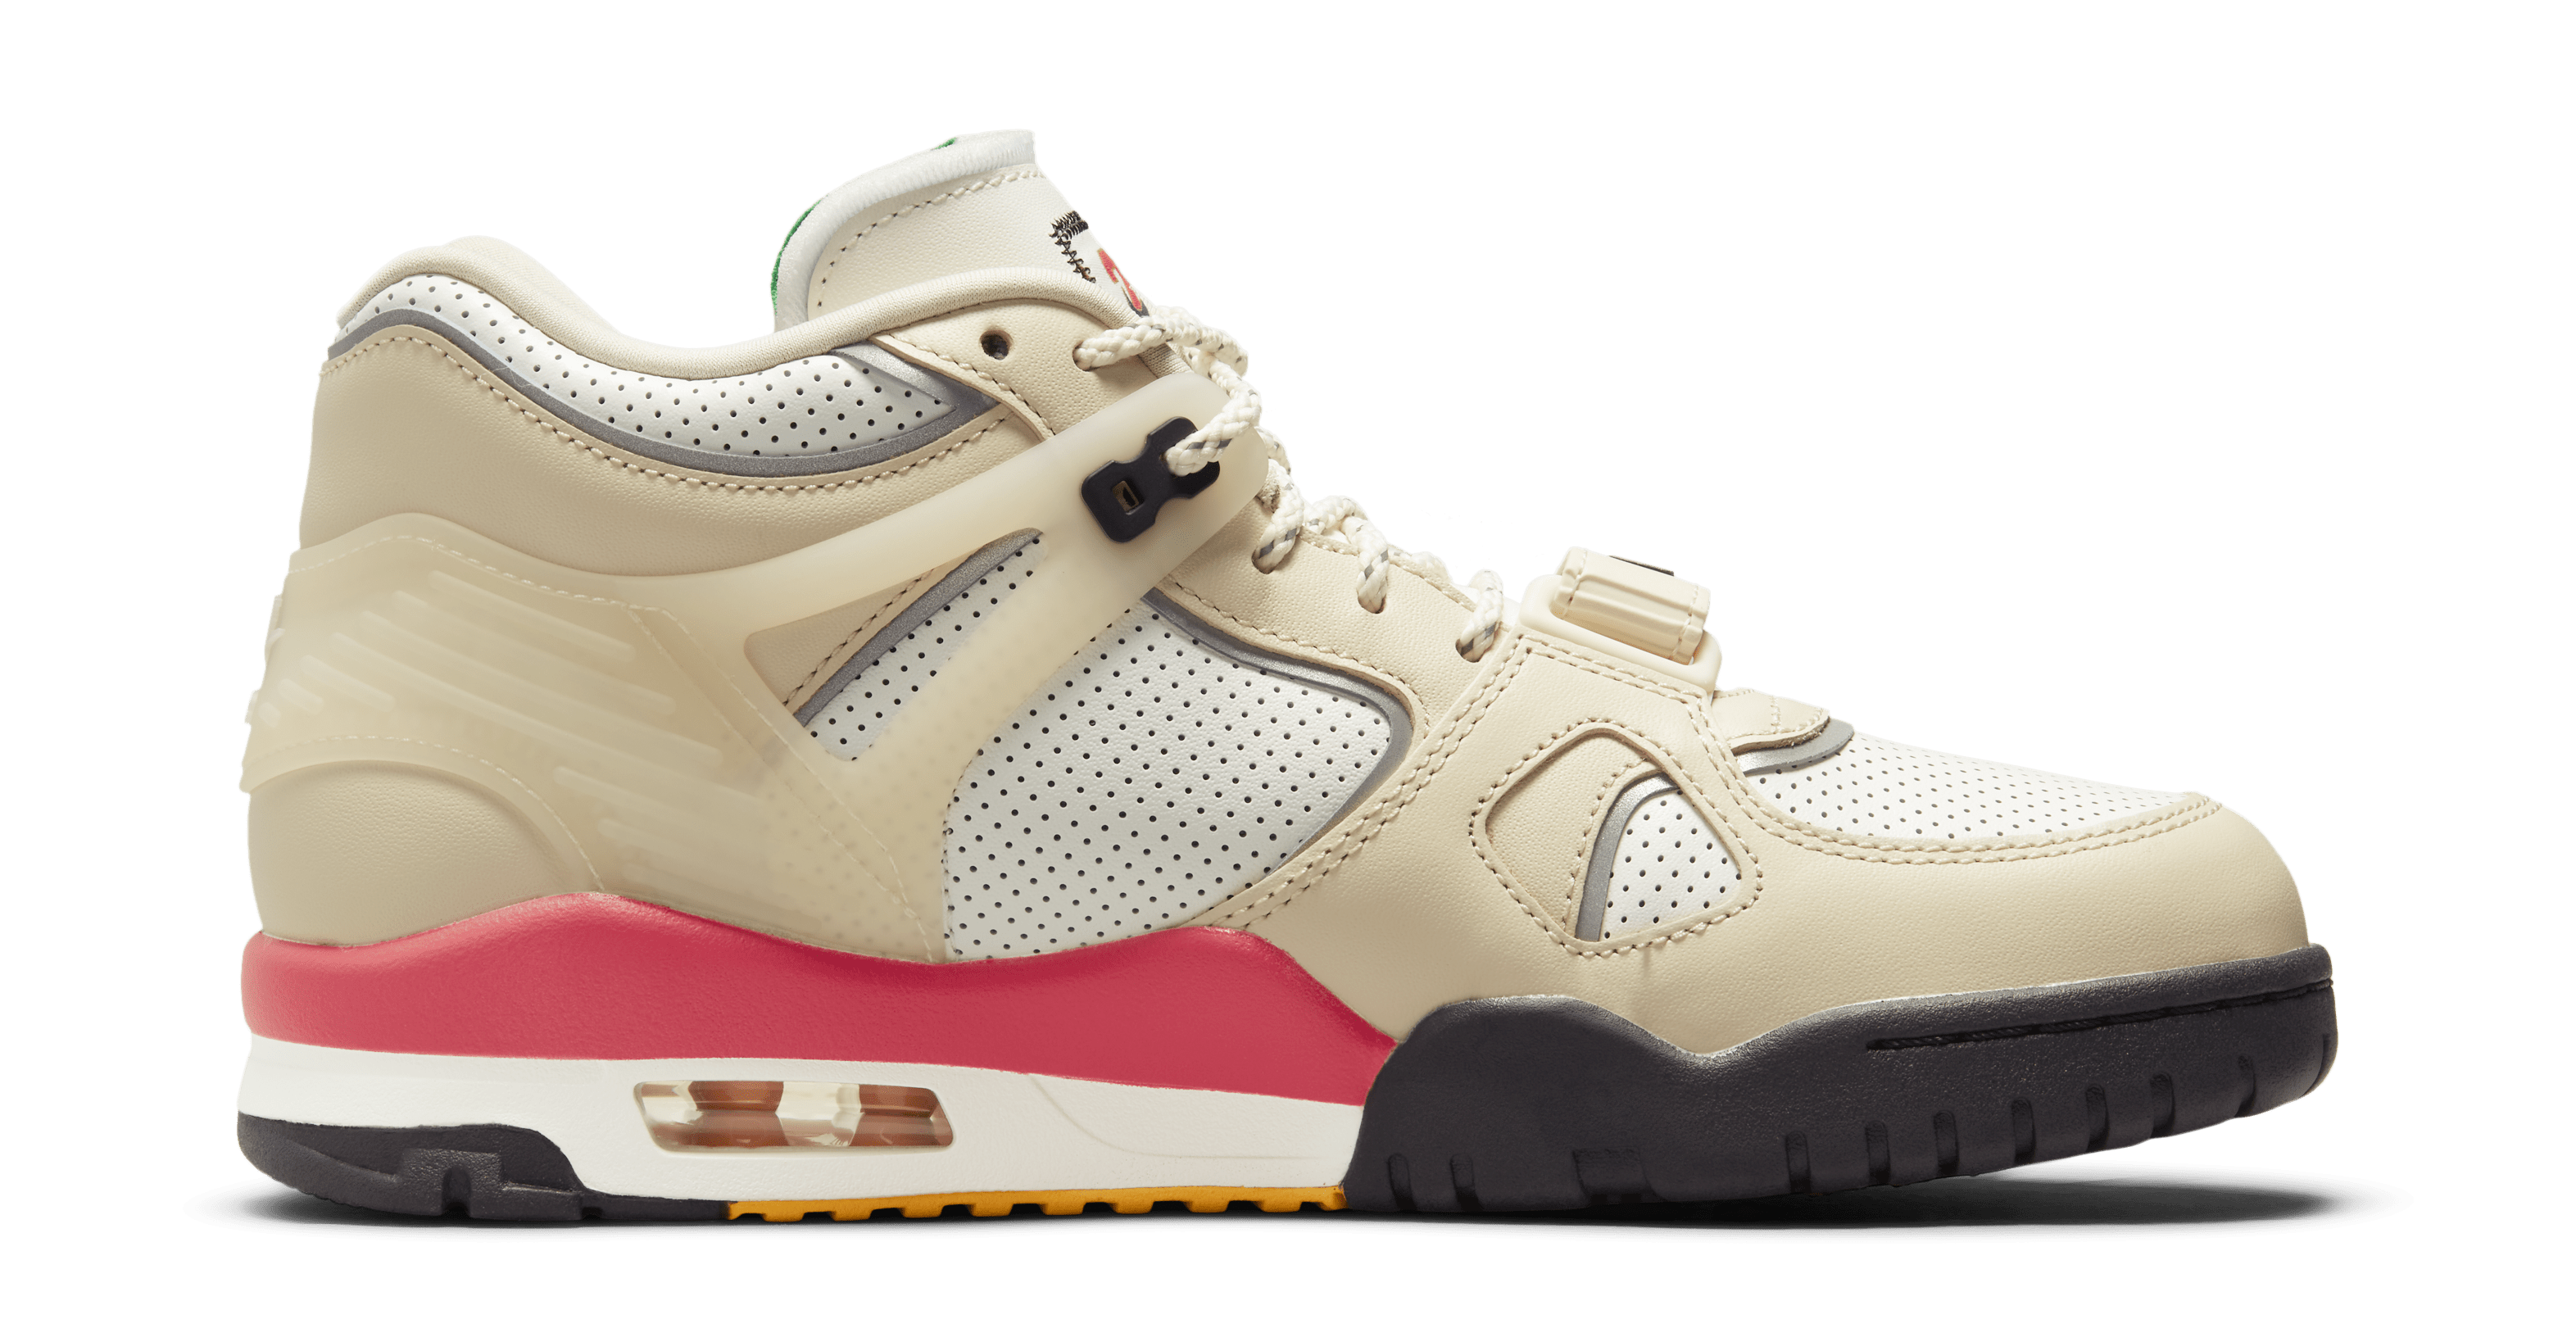 Nike Saquon Air Trainer III DA5403-200 Medial